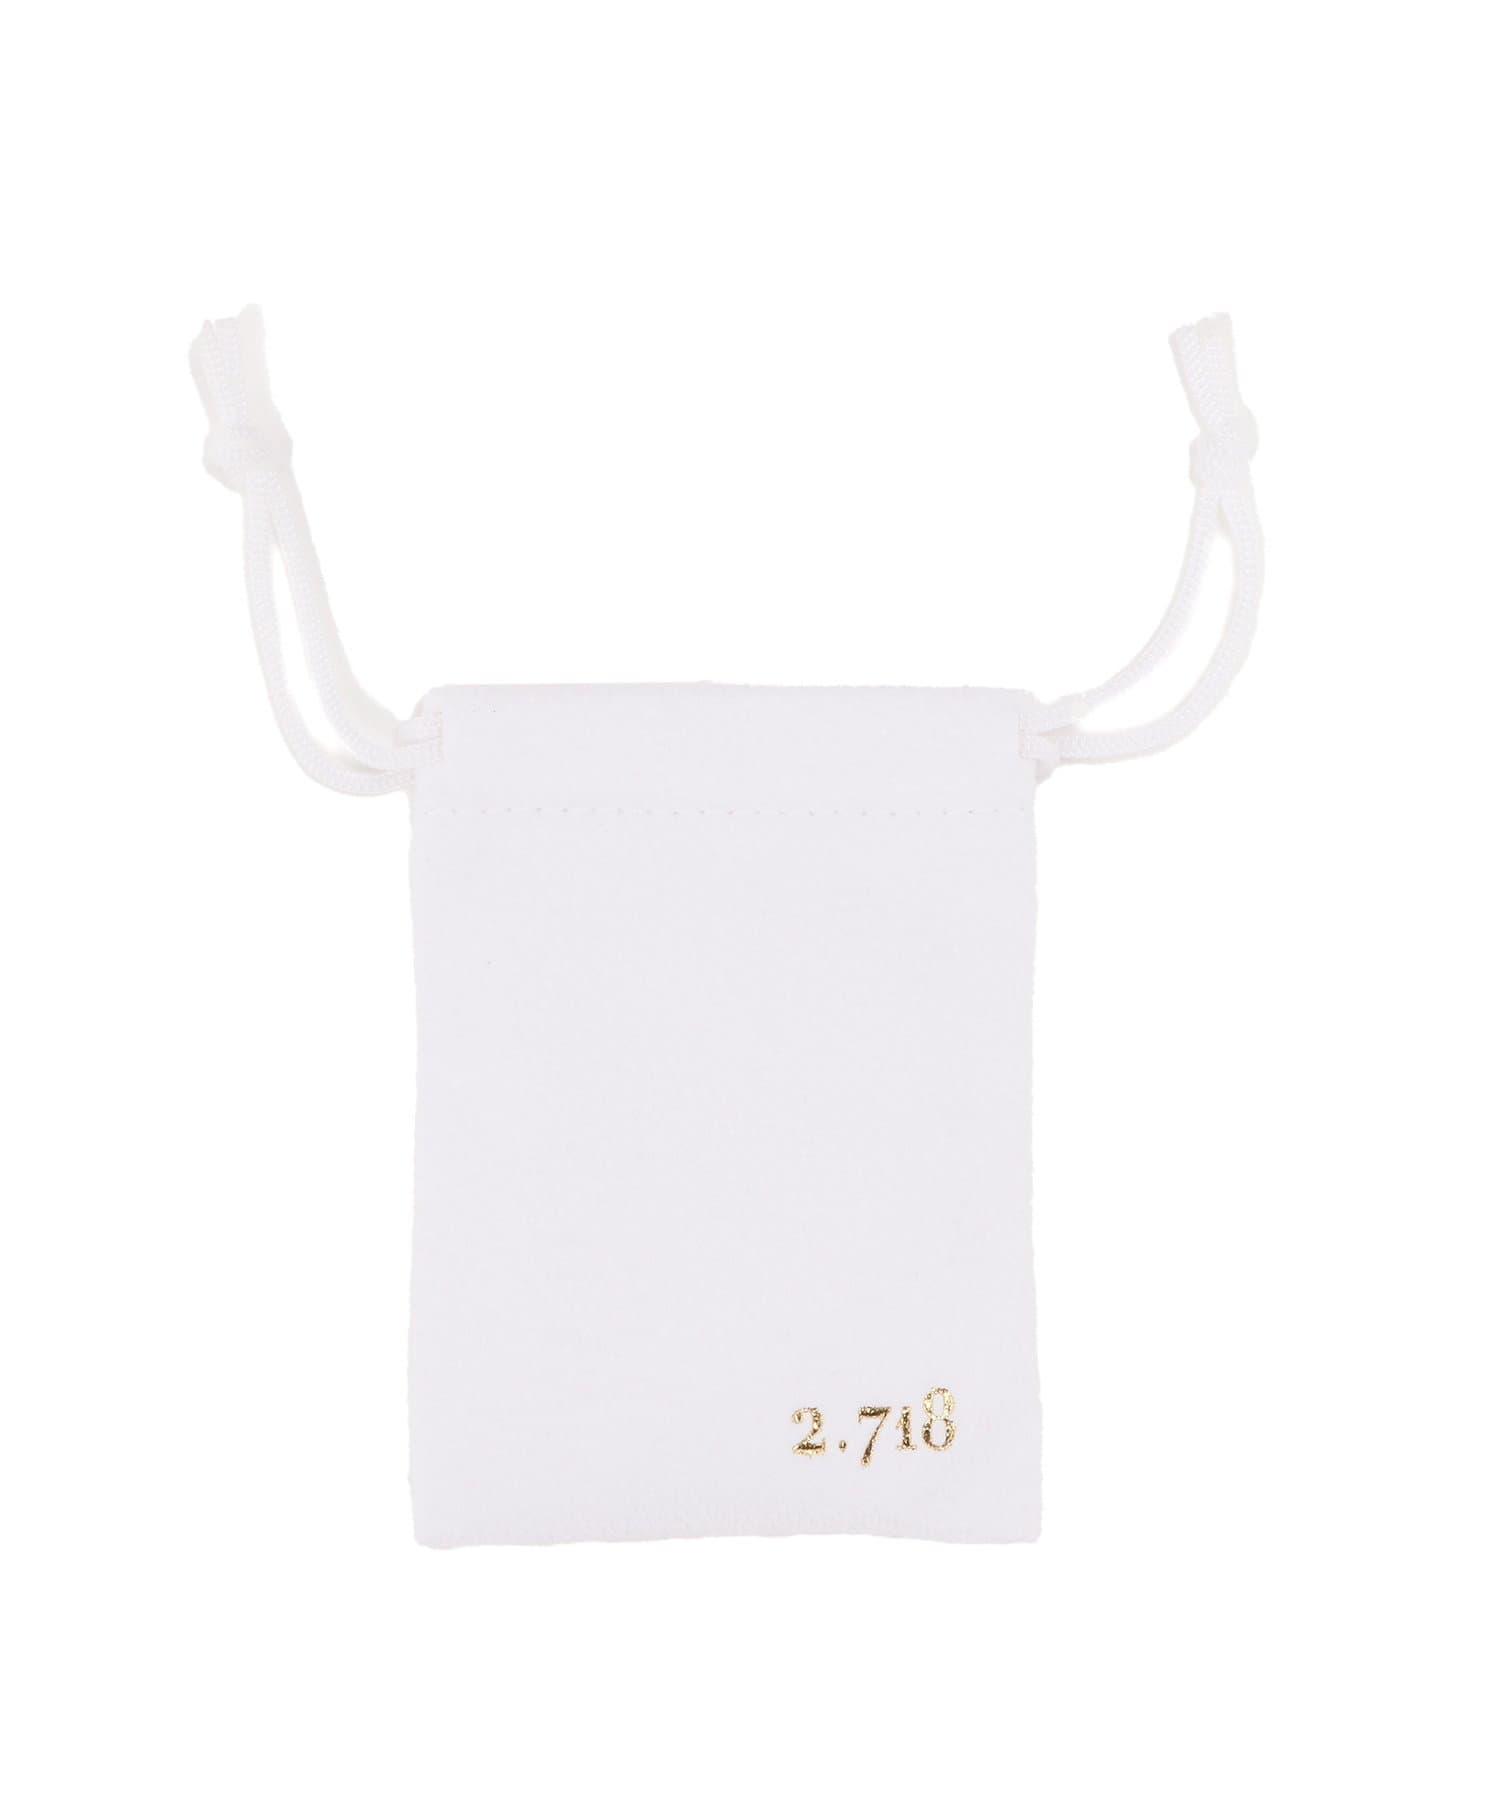 Whim Gazette(ウィム ガゼット) 【2.718】フープピアス10